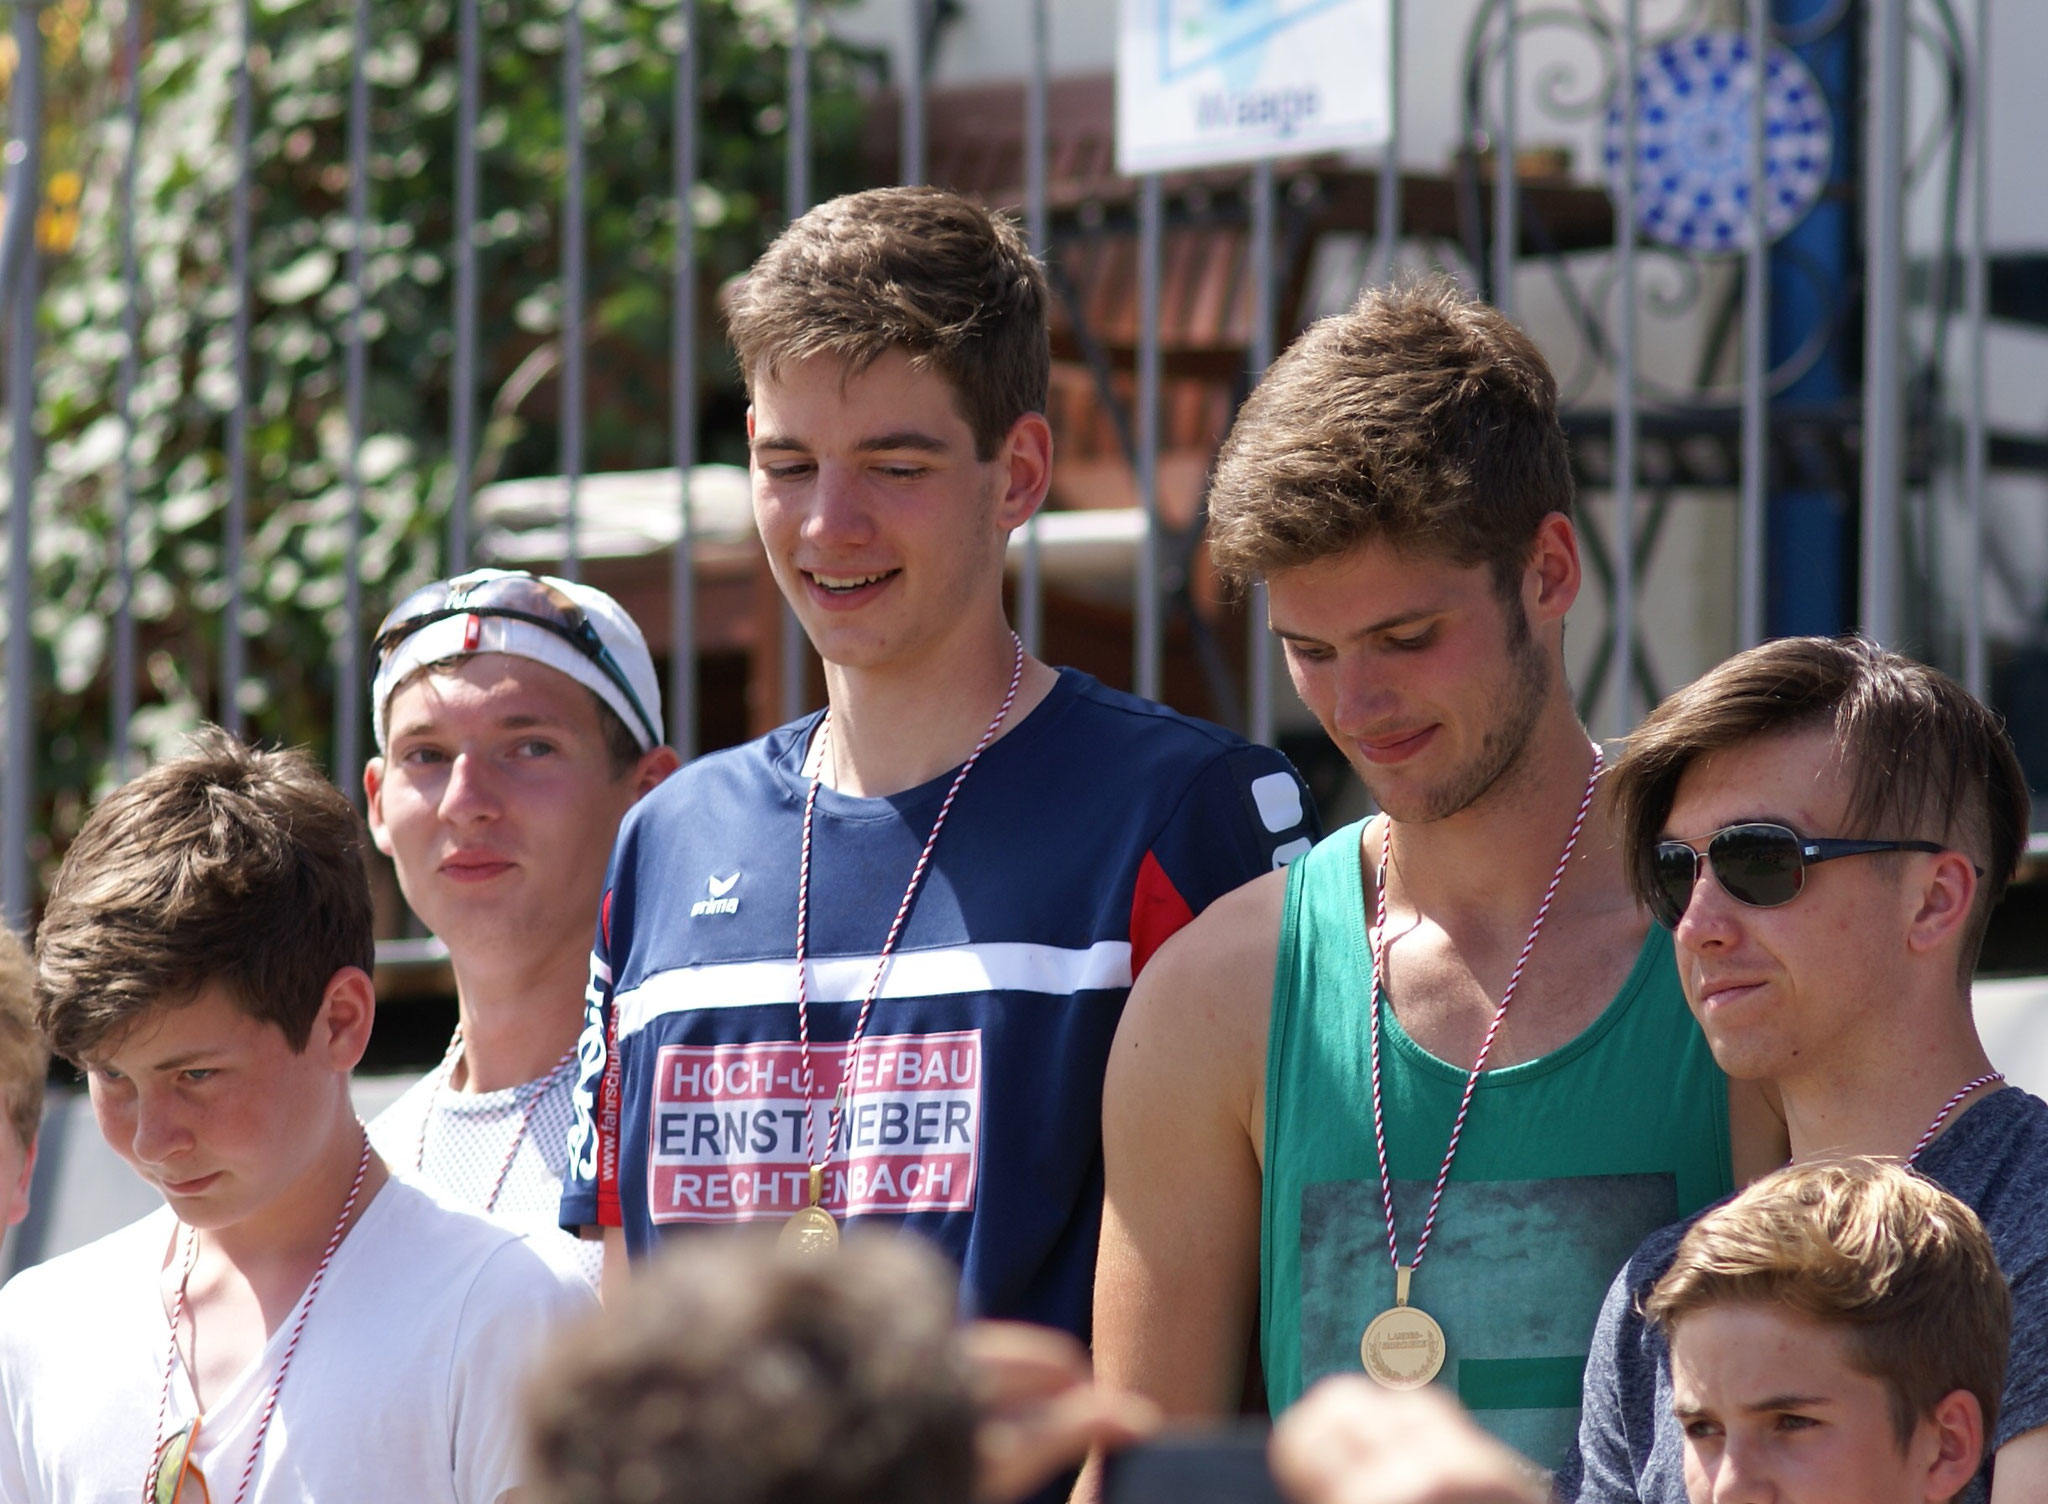 Gold Medaille für Nys, Gabriel, Jannis, Till, Fabian